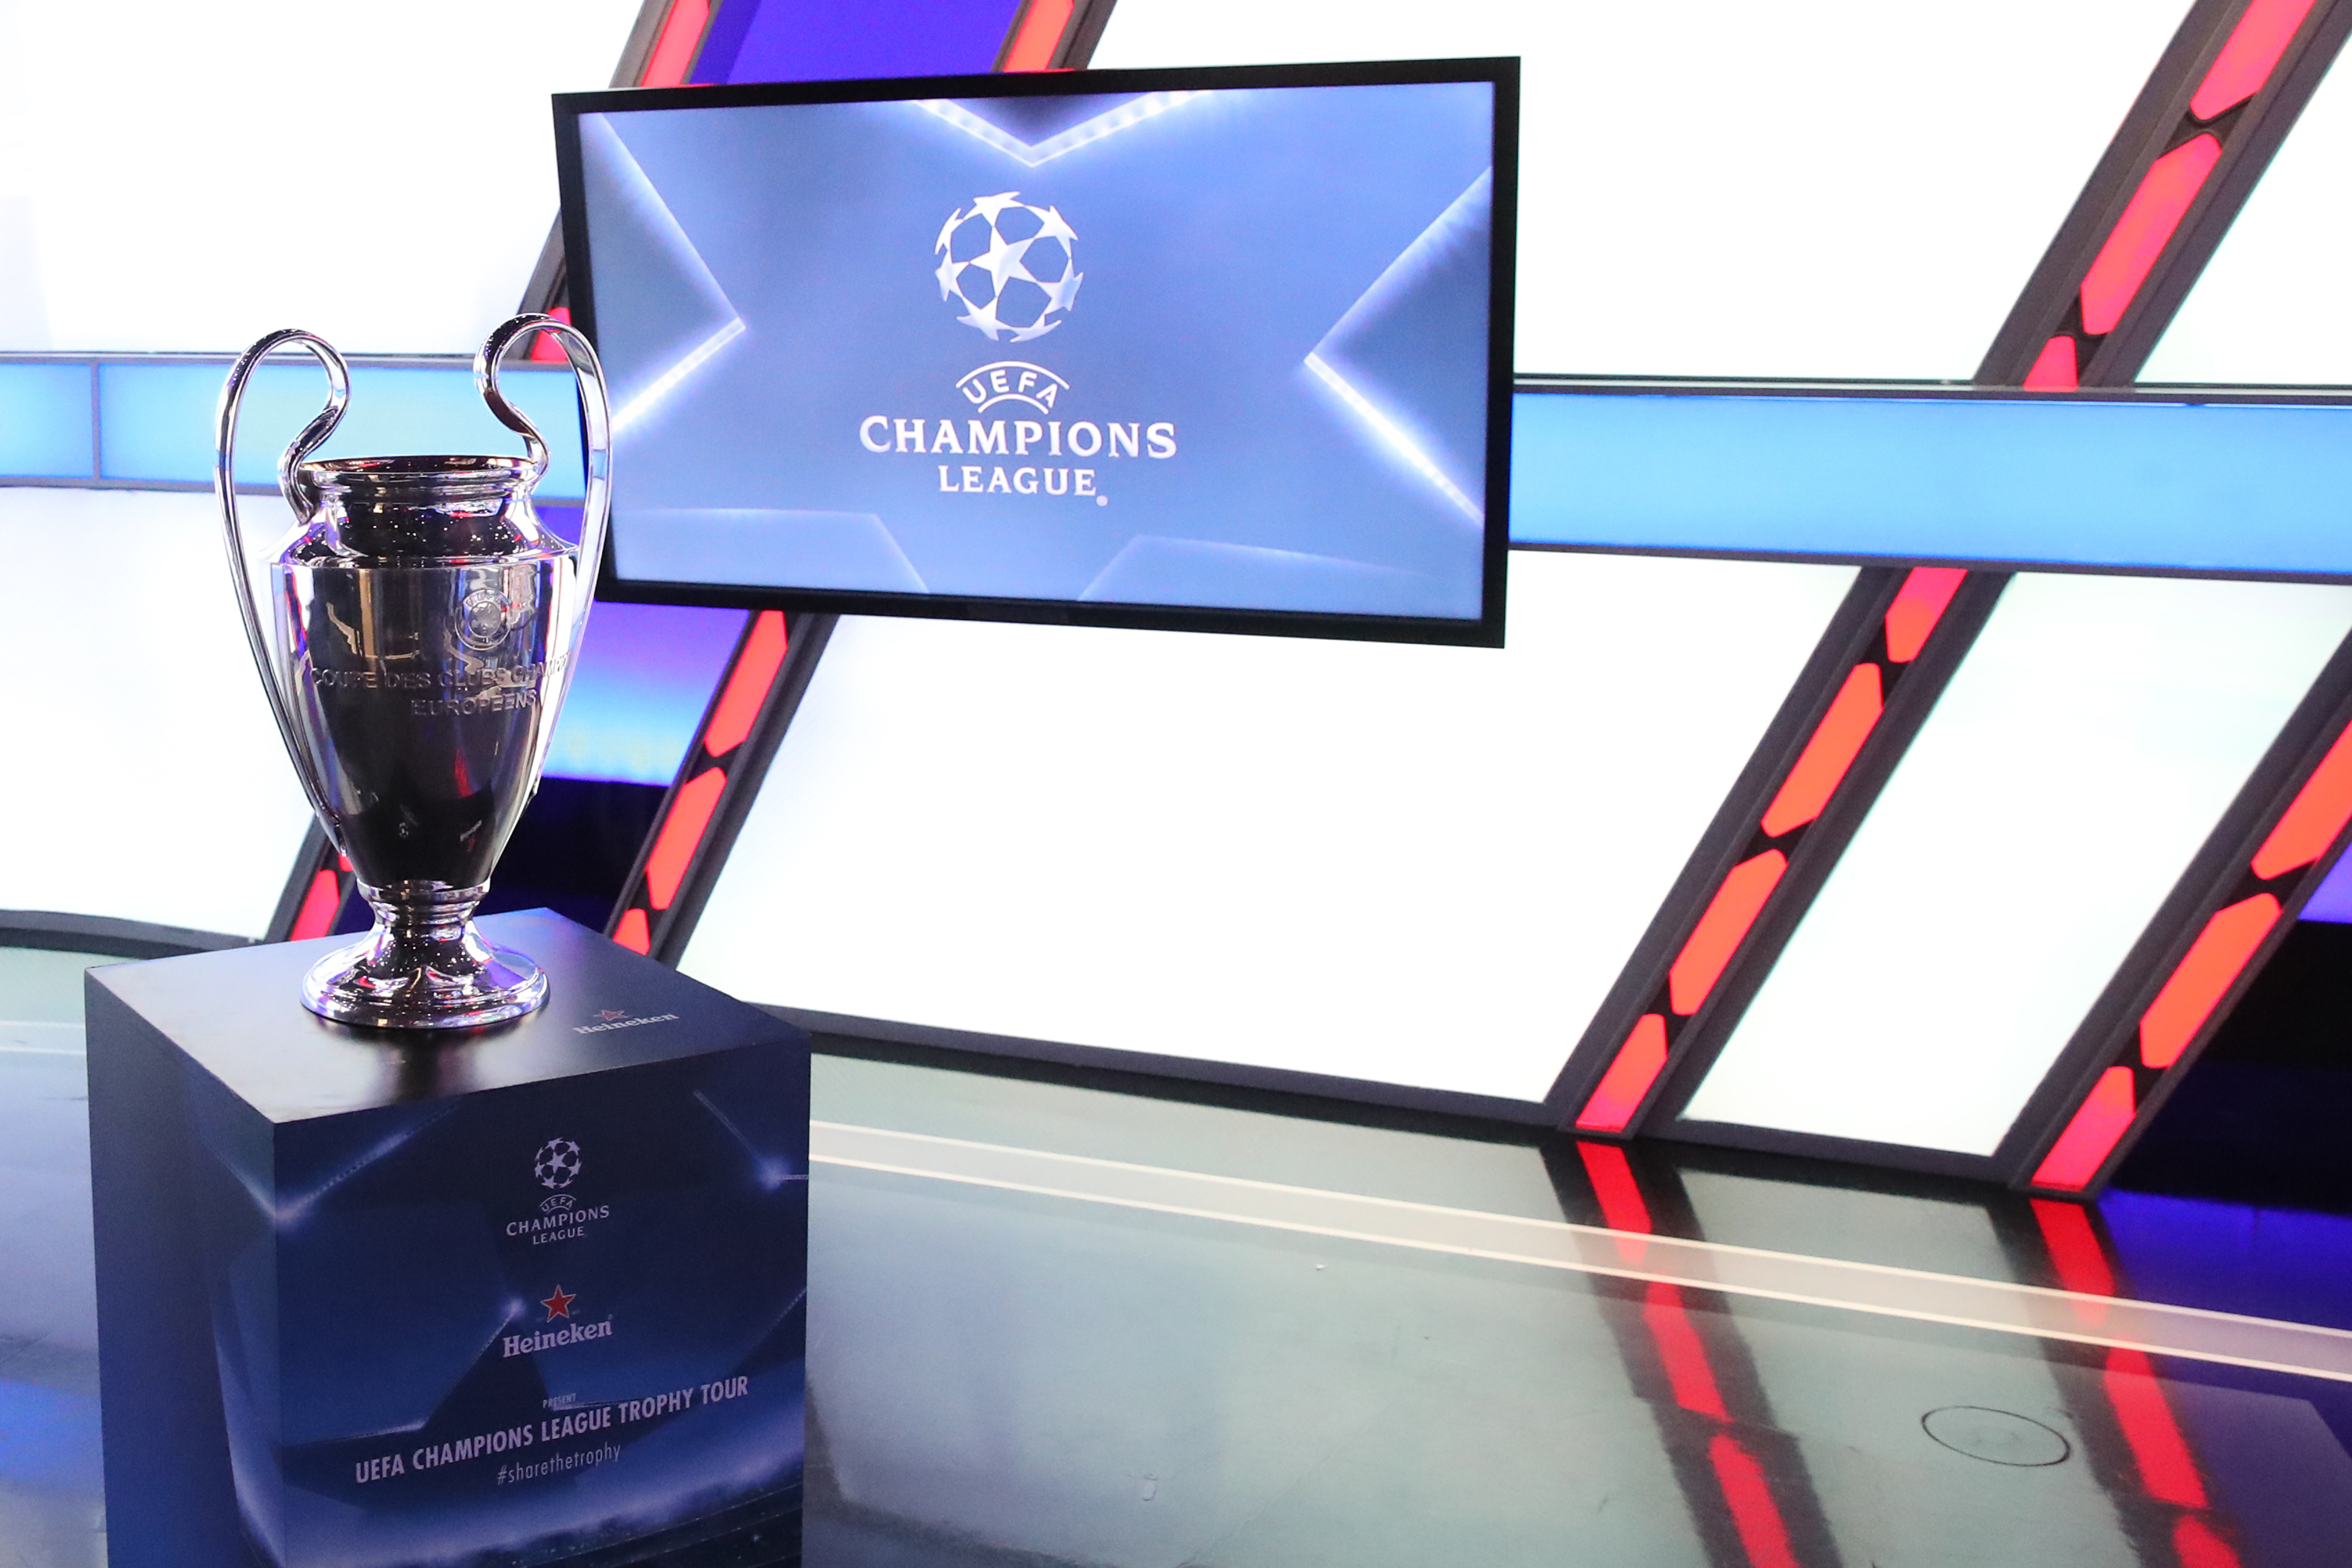 UEFA Champions League Trophy Tour presented by Heineken - Mexico City